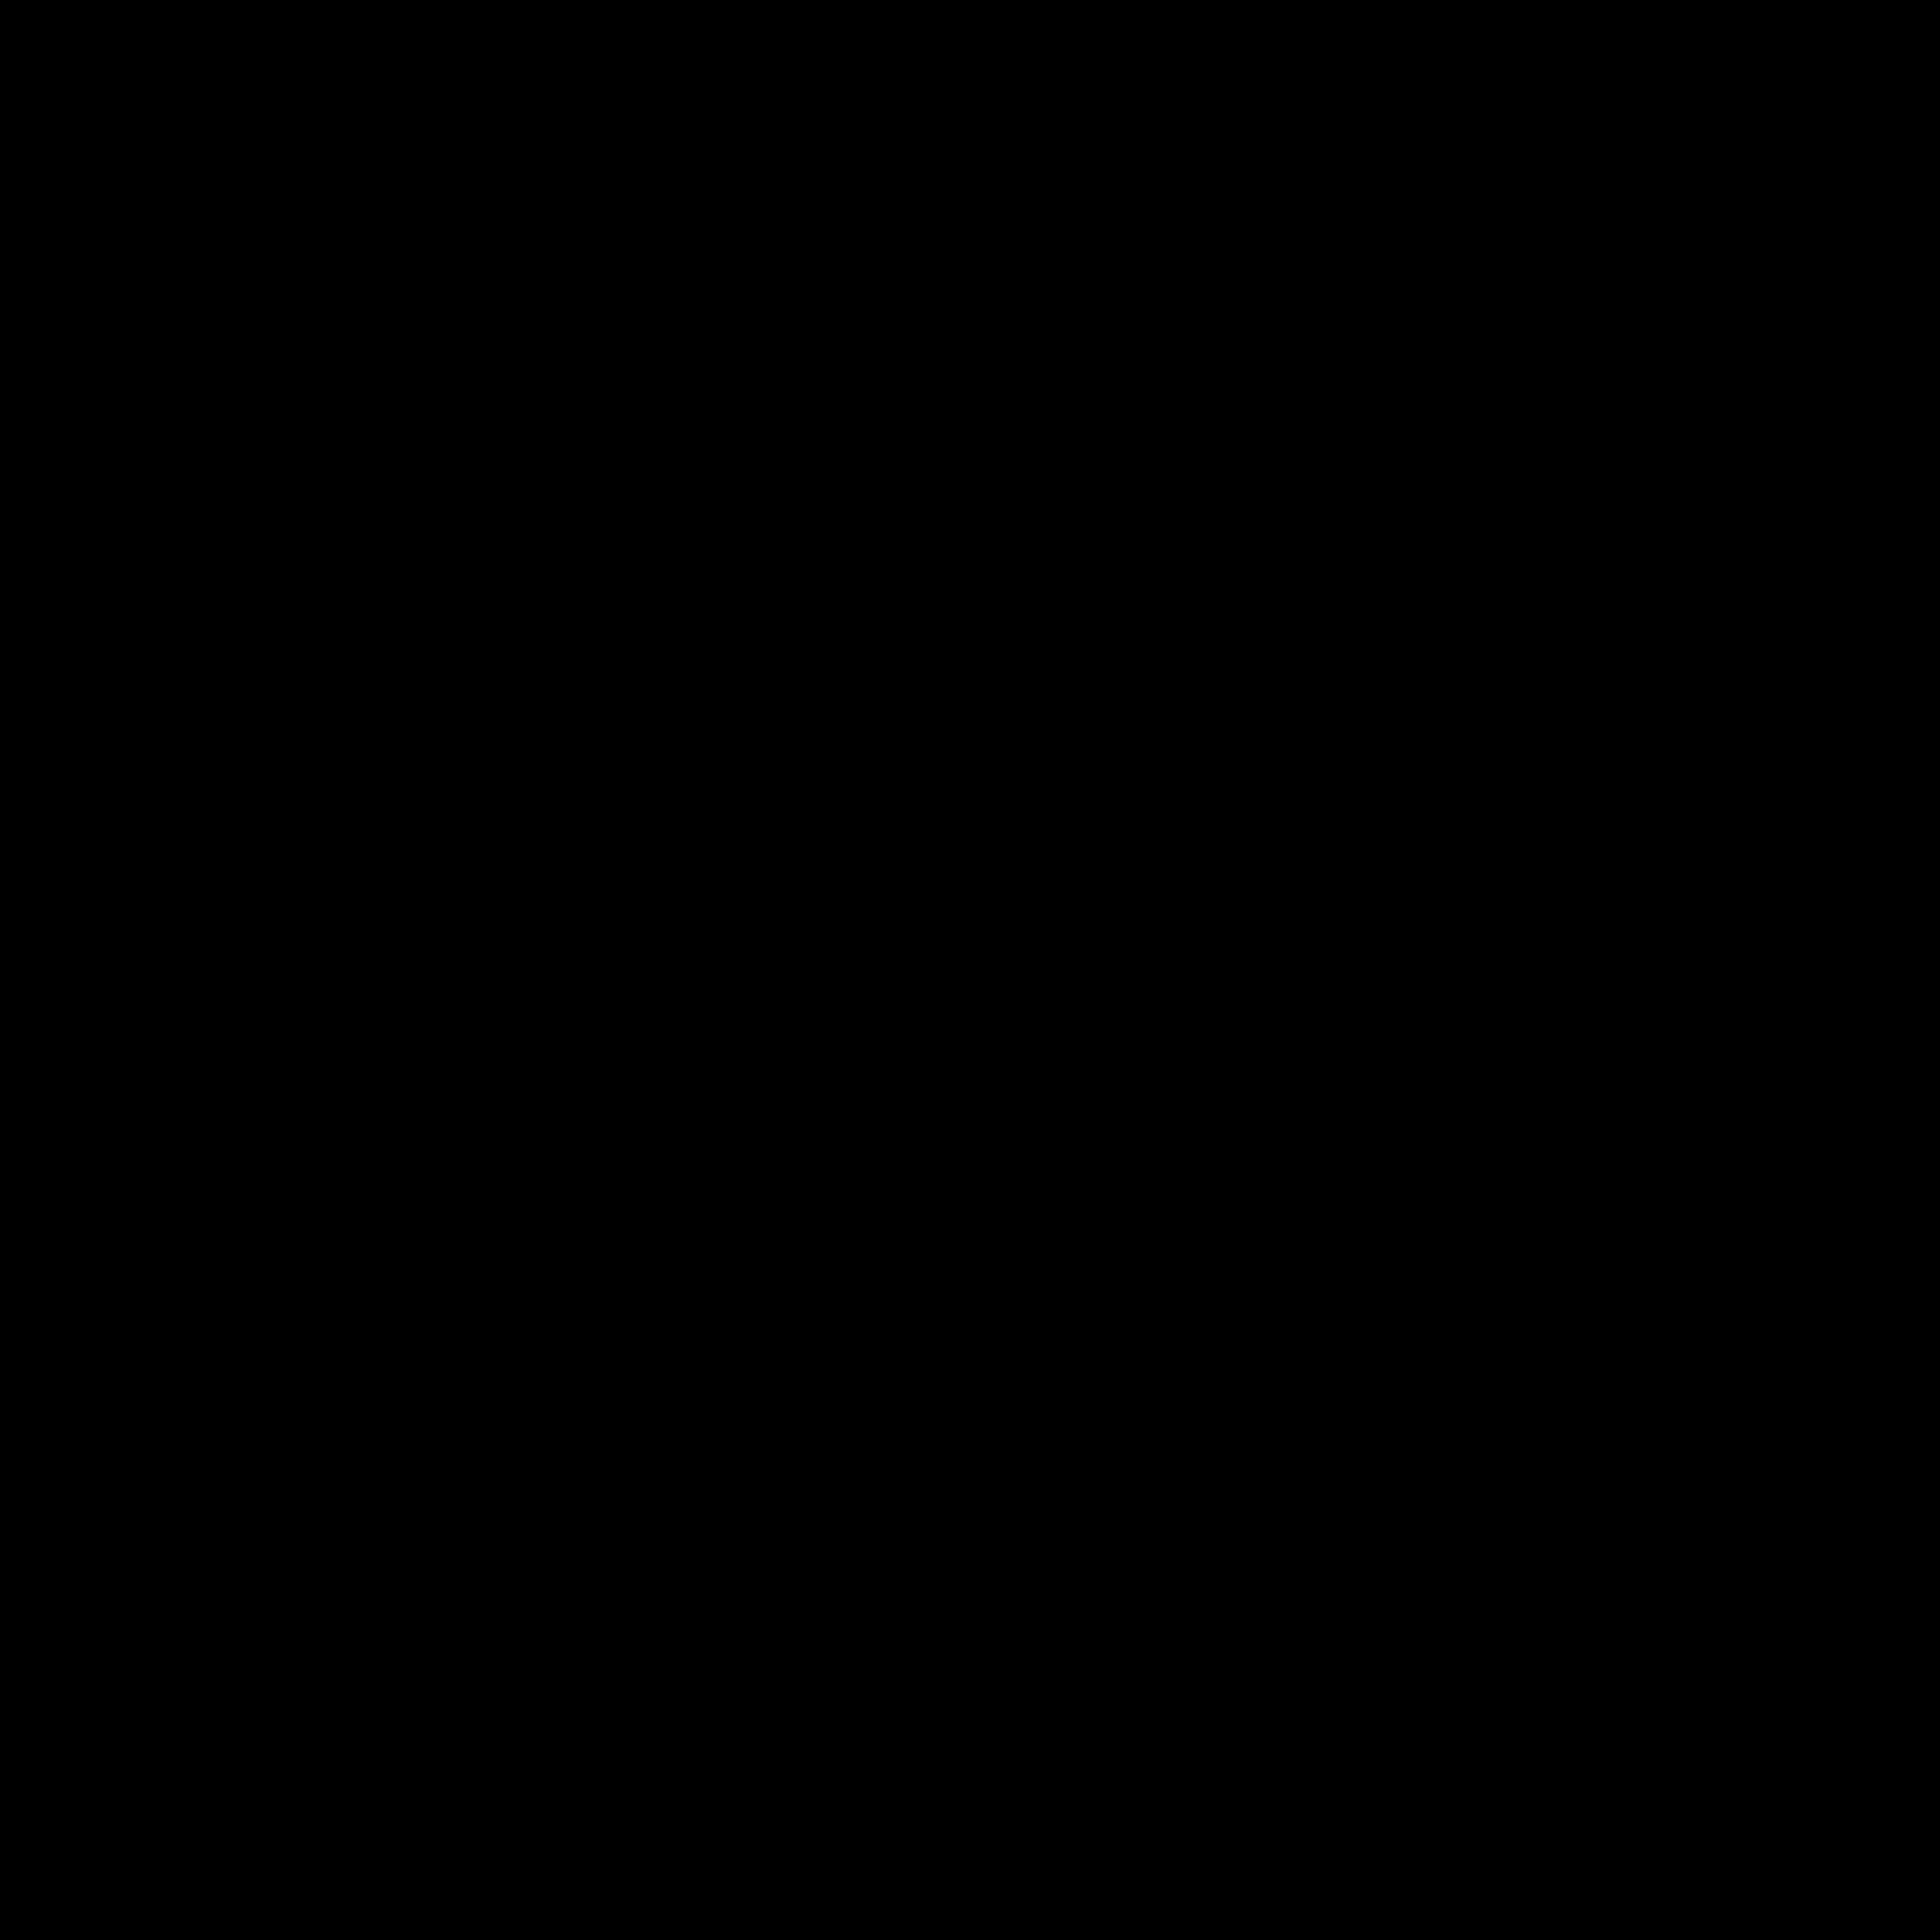 starz logo 0 - STARZ Logo